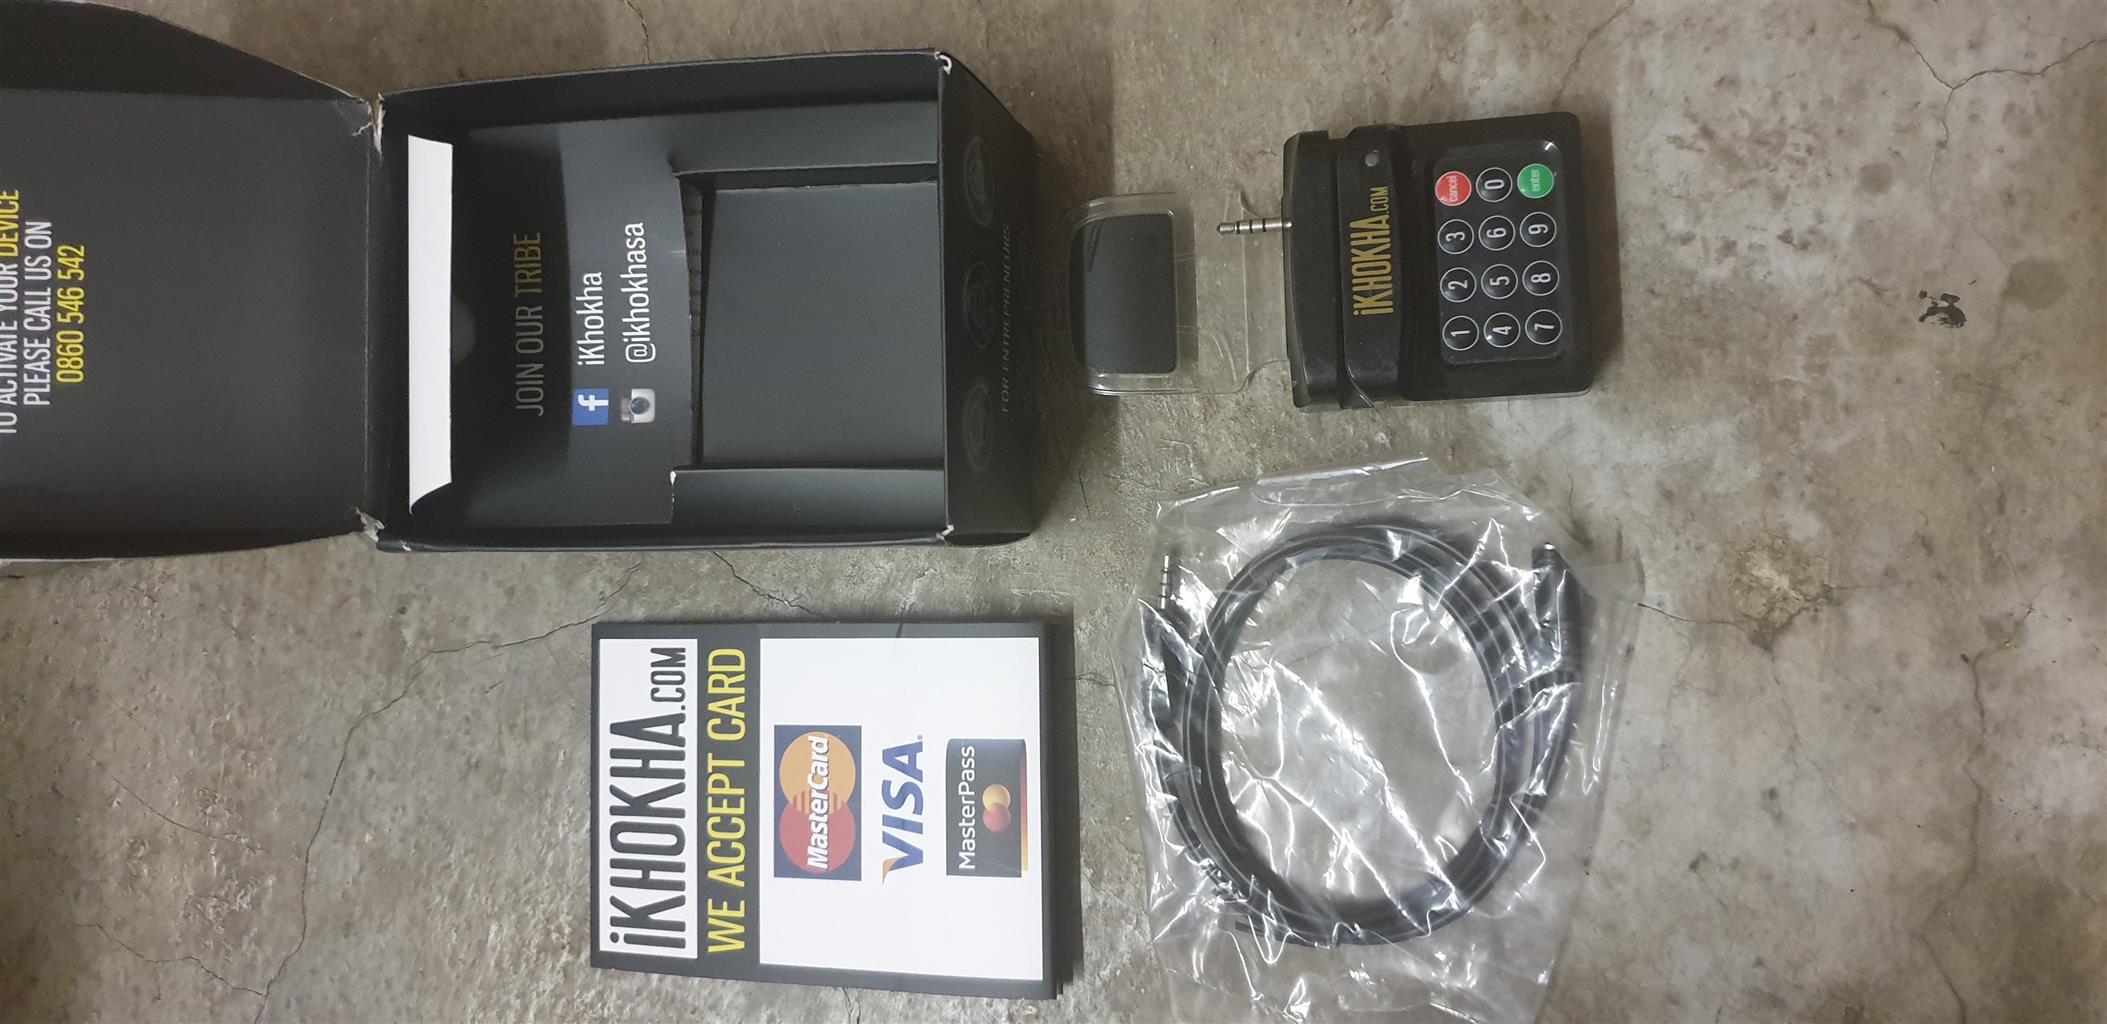 iKHOKHA Mobile Credit card Machine.